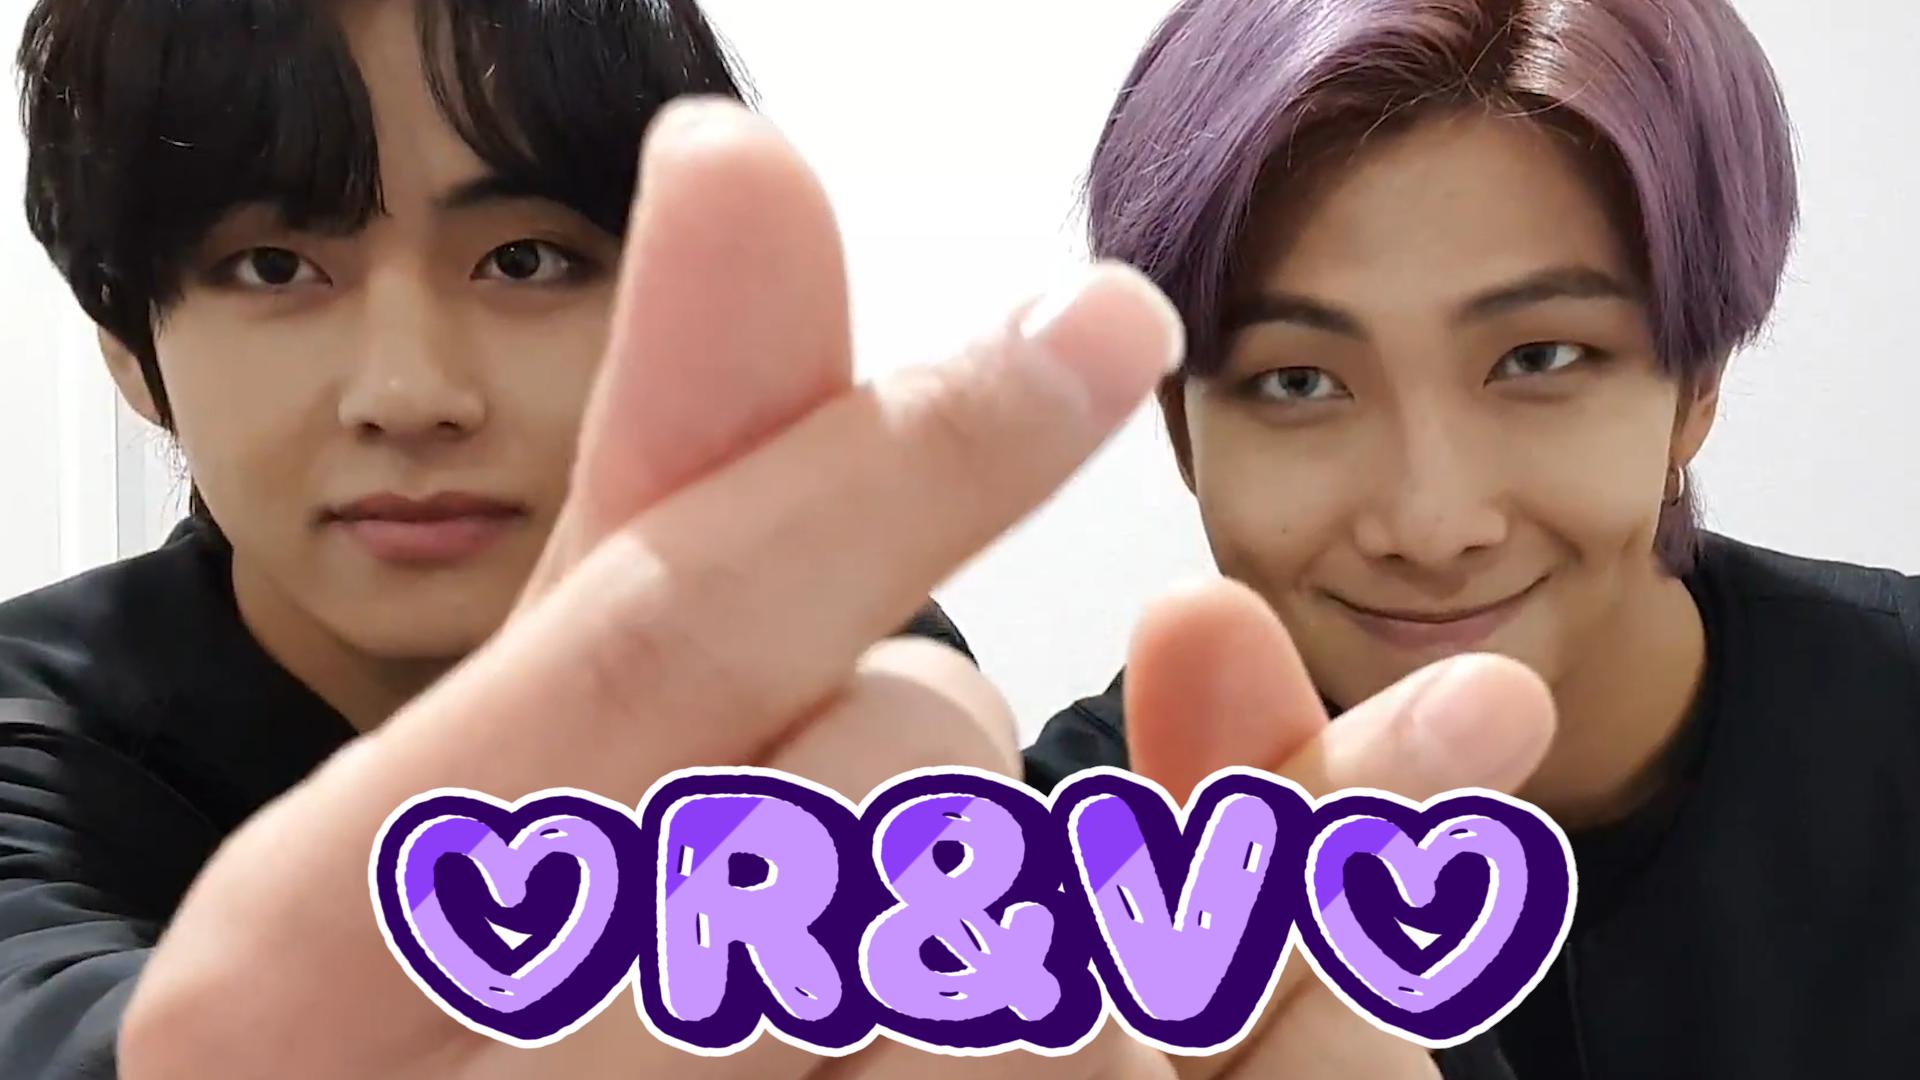 [BTS] 나는 A&D.. 알앤뷔 큐티력에 (A)ㅏ주 (D)지버져요..ლ(ˊᗜˋლ)💕 (RM&V talking about their songs)